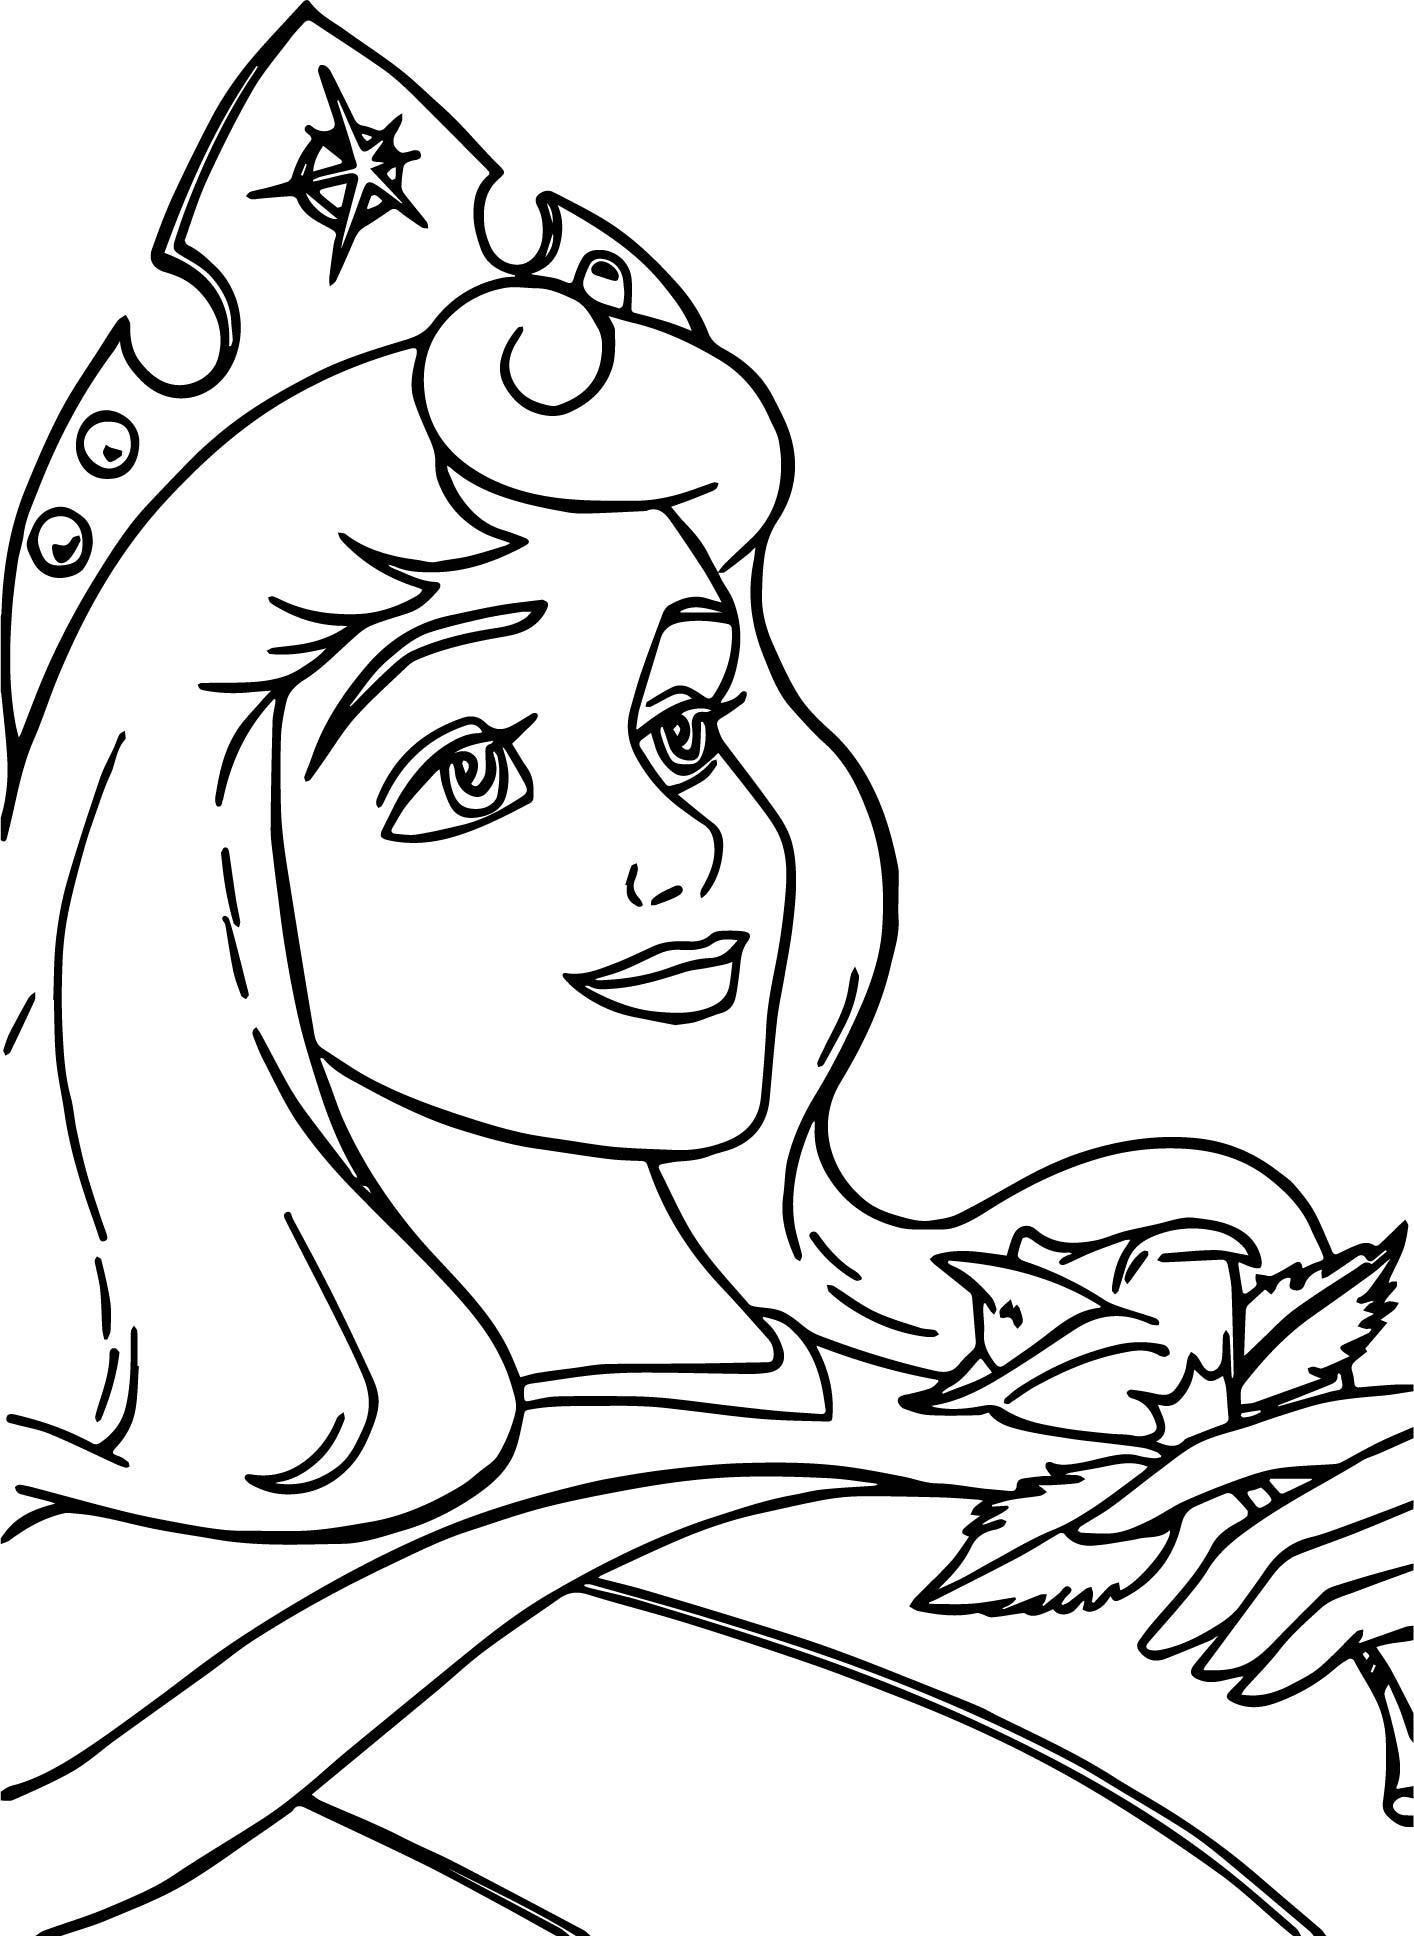 Aurora Awake Cartoon Coloring Page